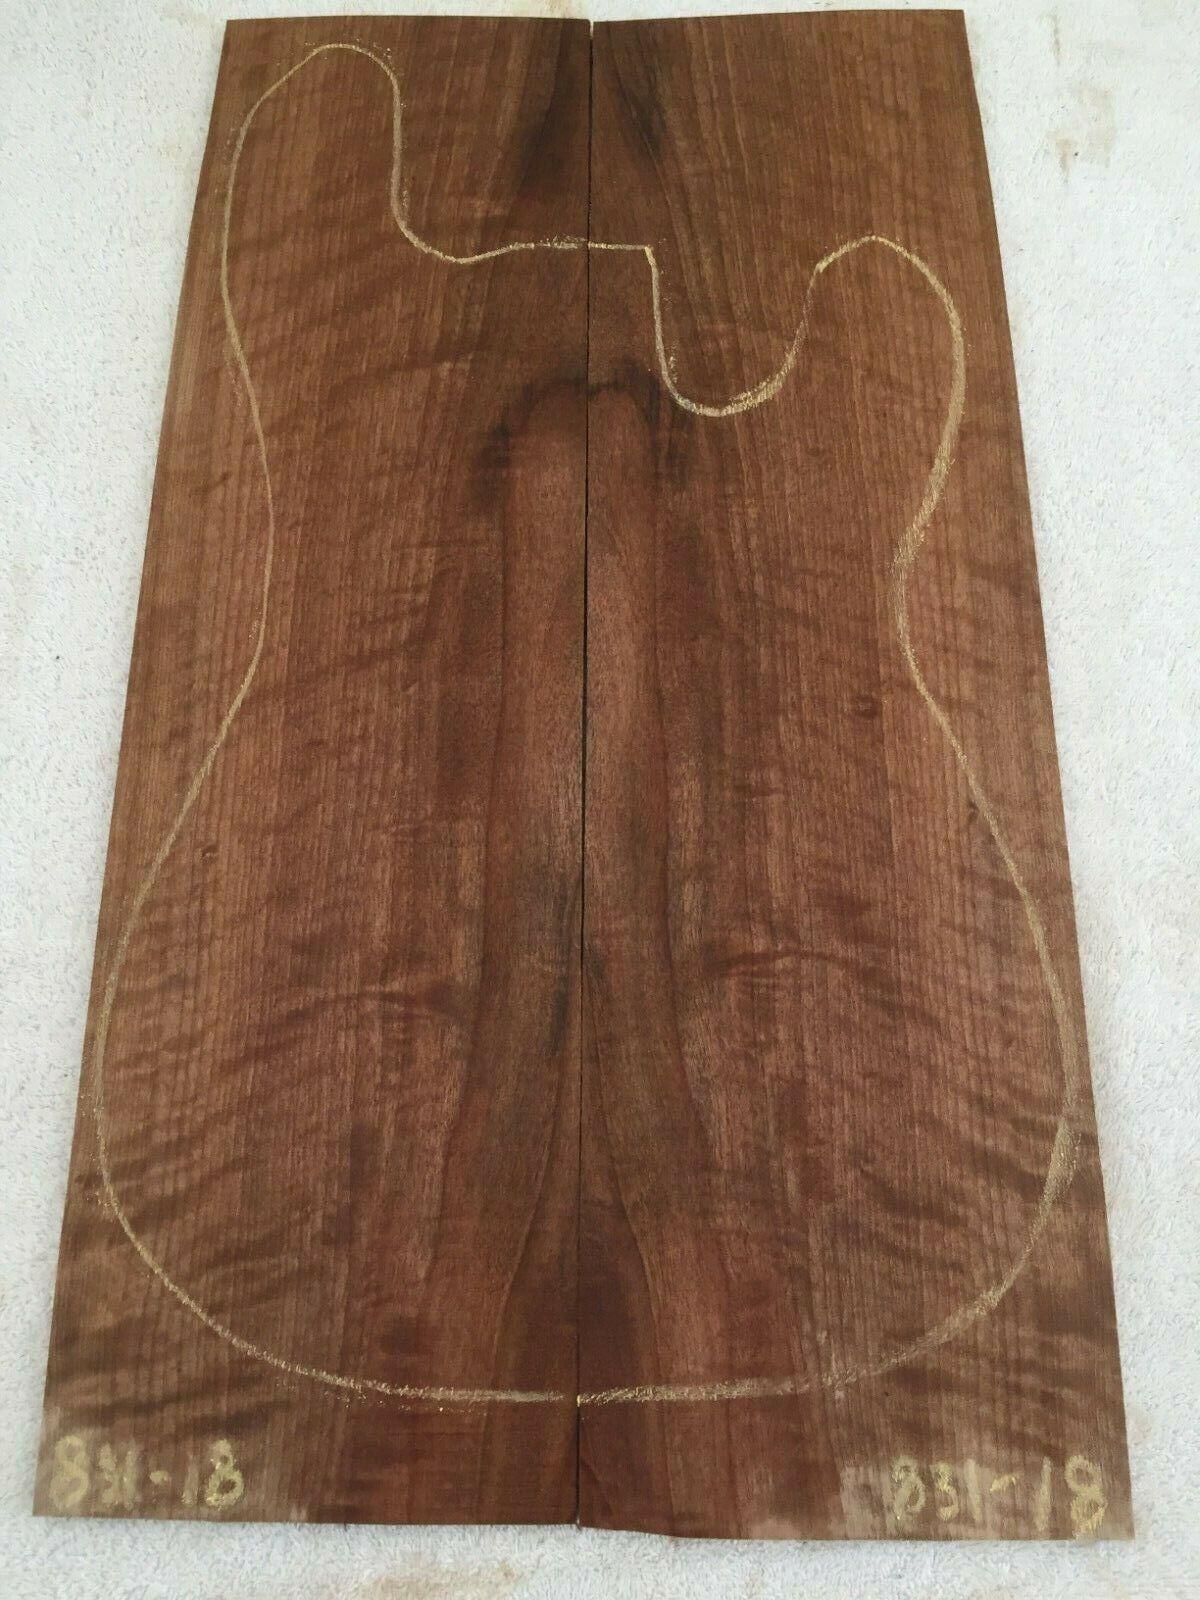 English Walnut book match set guitar tone wood .27 x 12-14 x 22.5    831-18